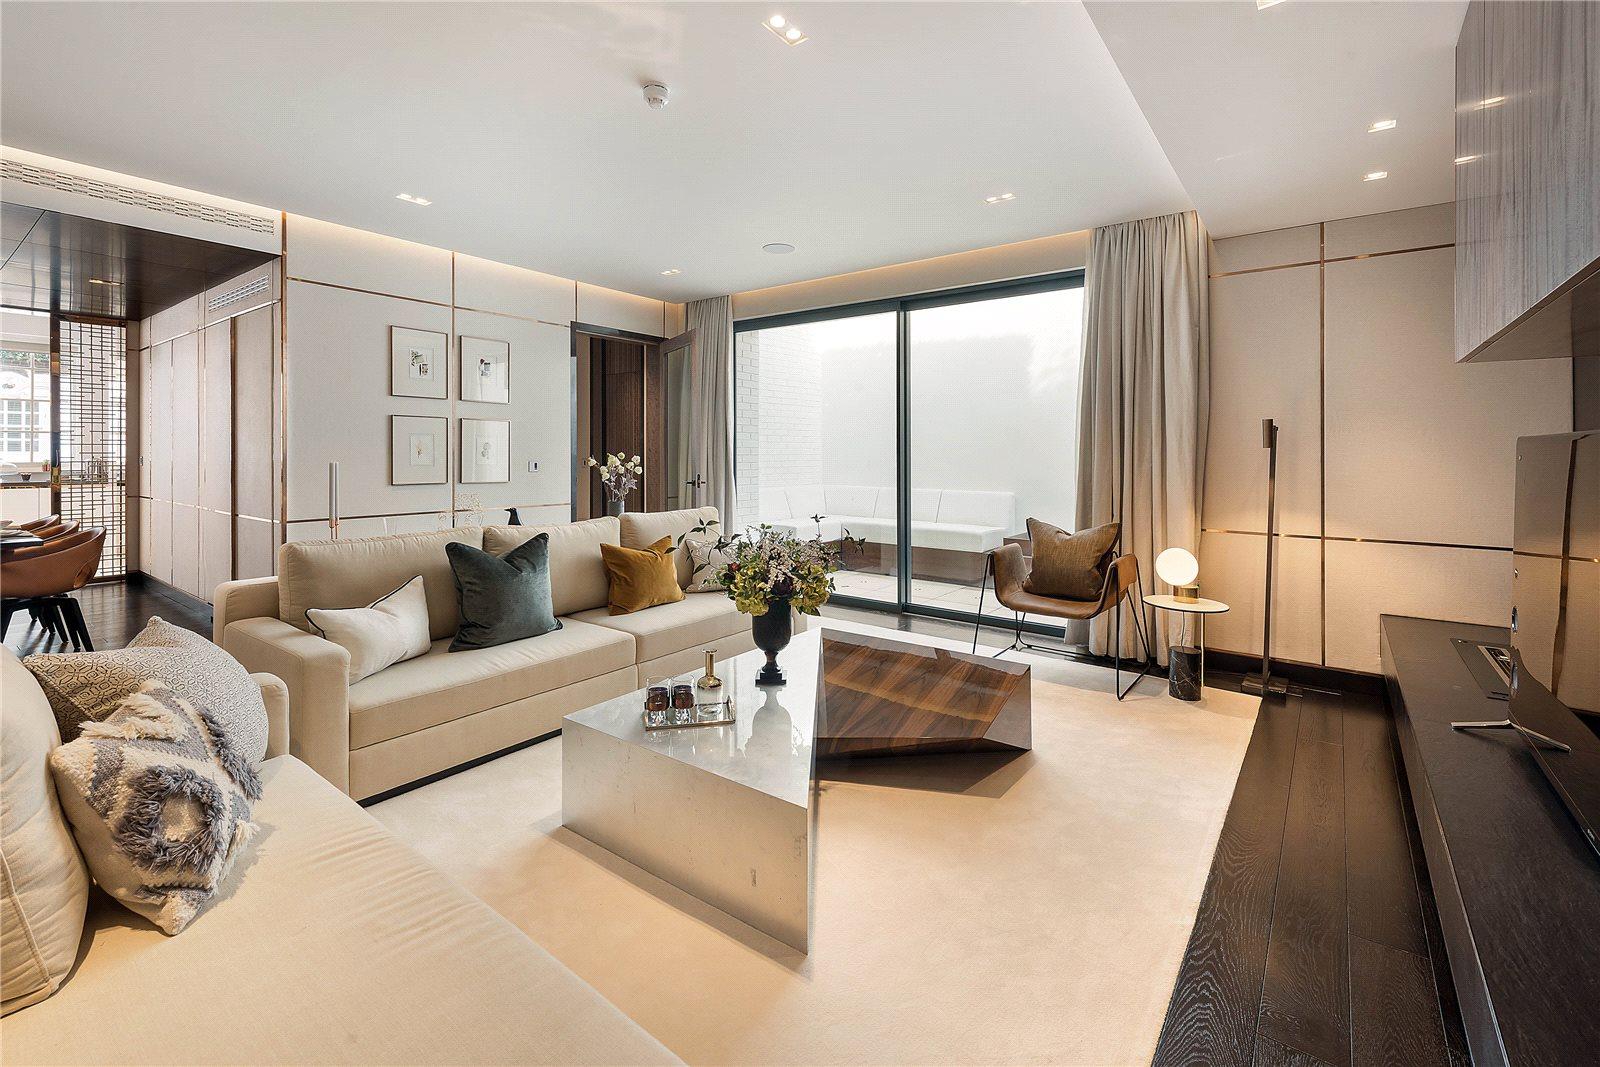 Single Family Home For Sale At Fairholt Street, Knightsbridge, London, SW7  Knightsbridge,